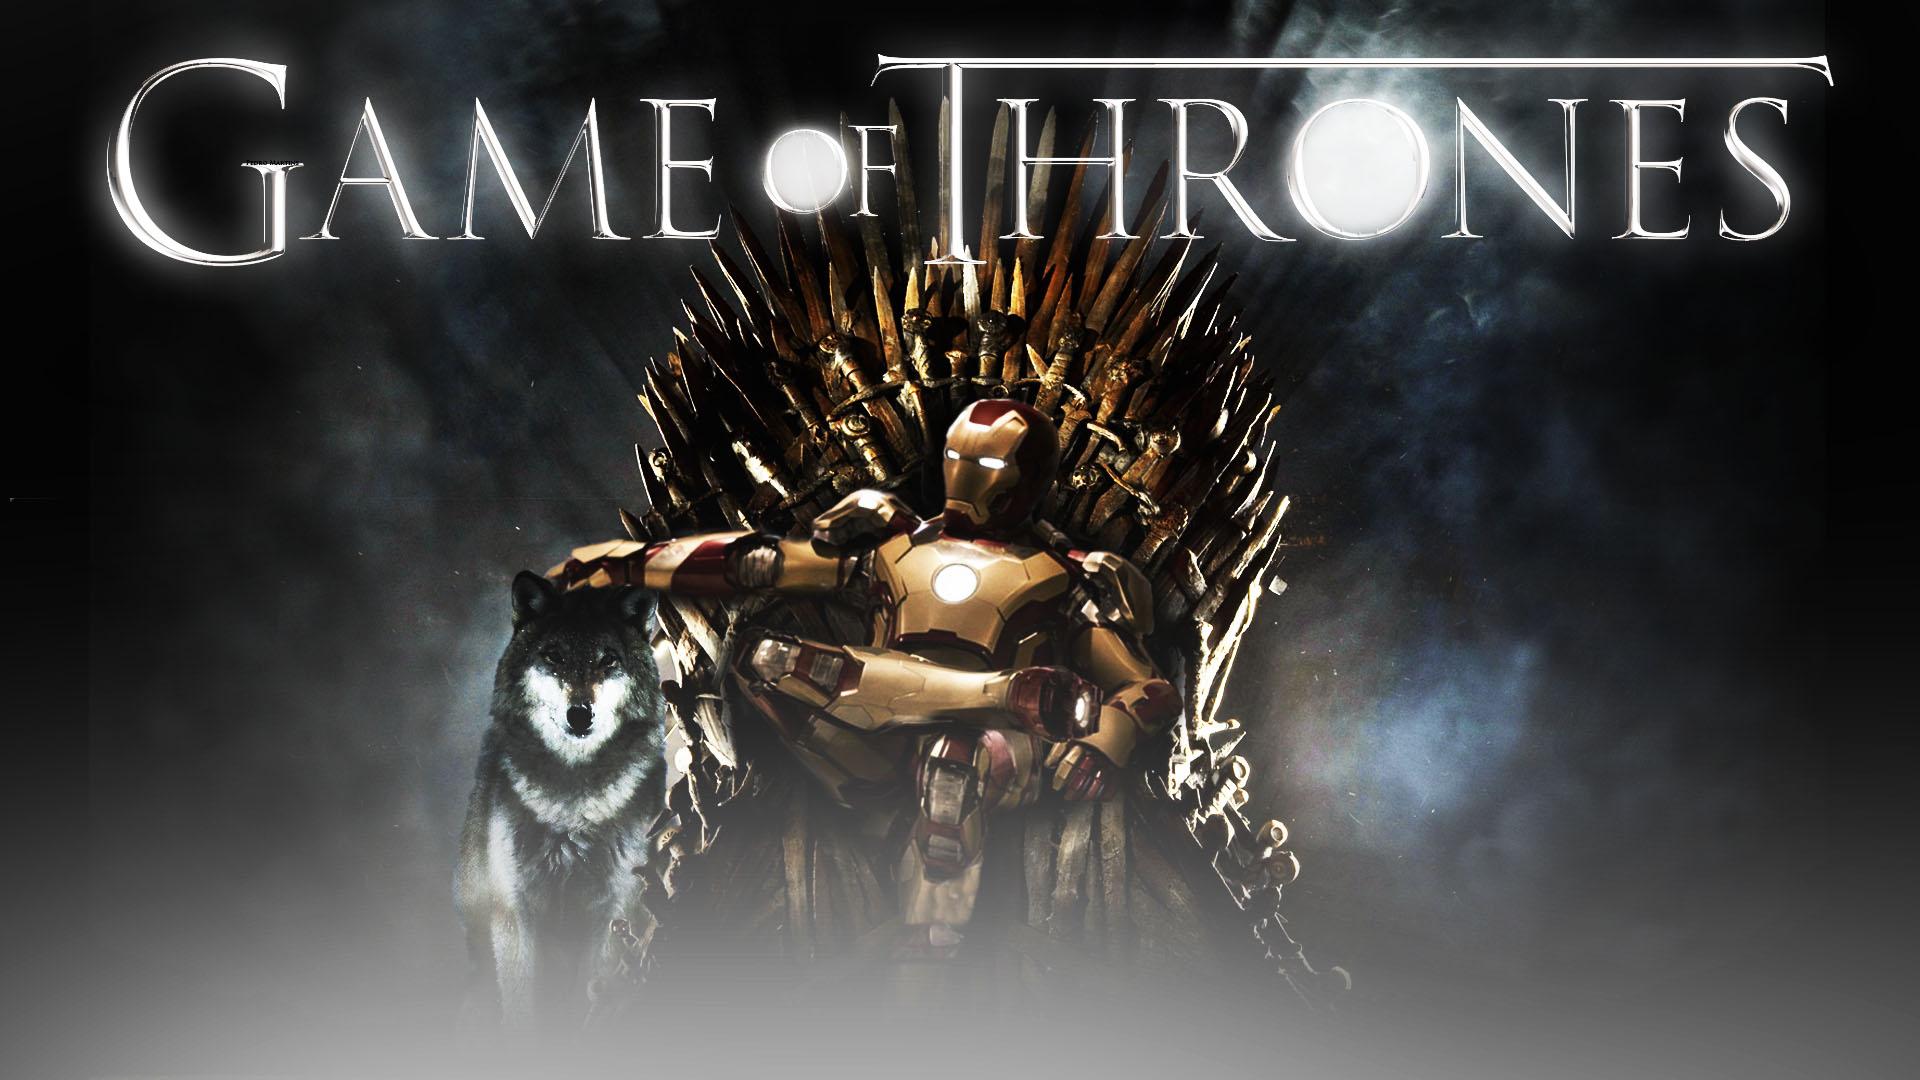 Iron Throne By Pedroobom On Deviantart